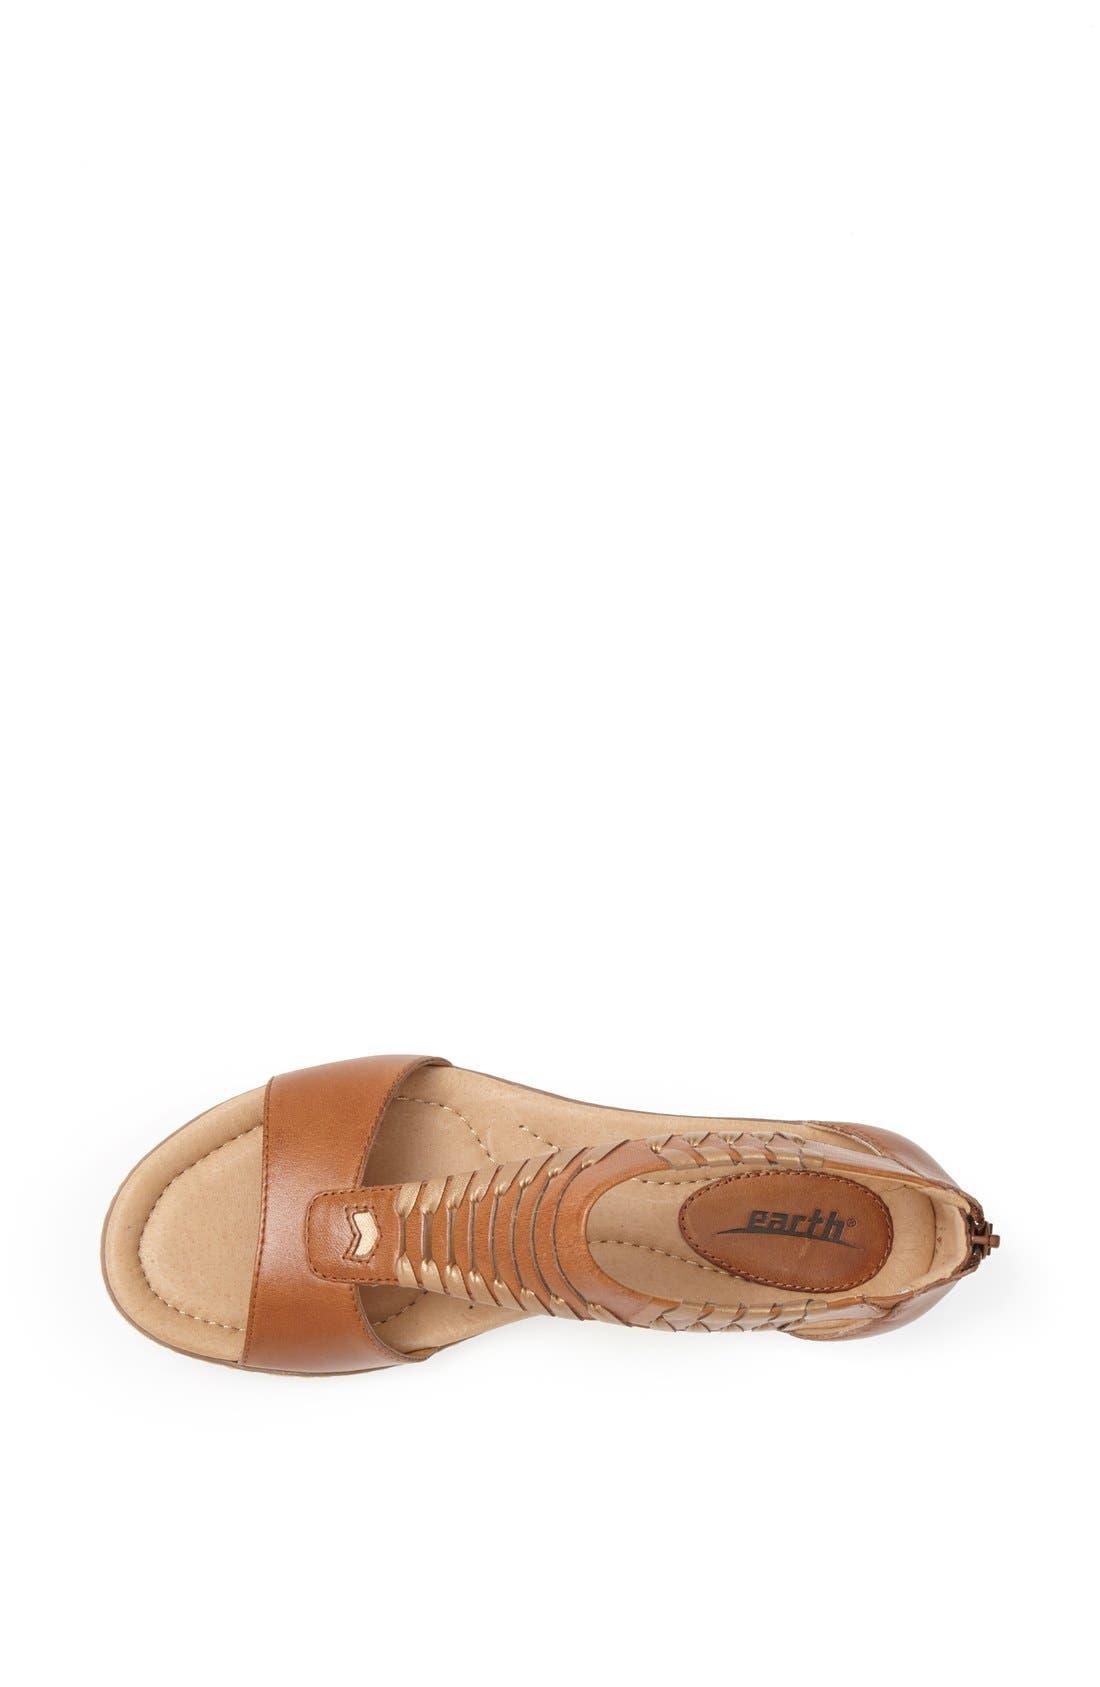 Alternate Image 3  - Earth® 'Shell' Cutout Leather Sandal